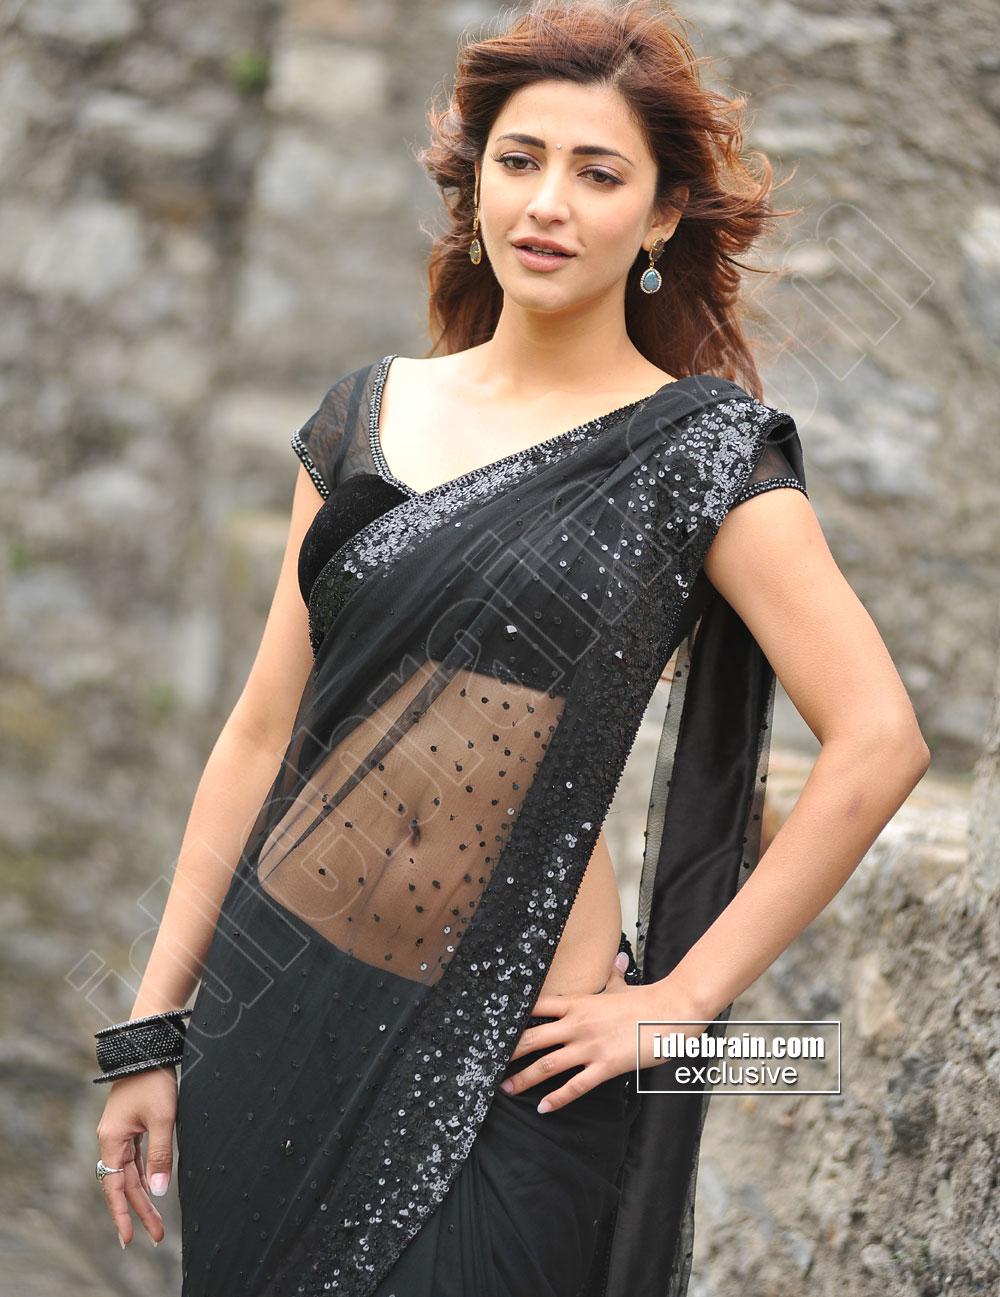 png freeuse stock Transparent saris. Shruthi haasan in black.